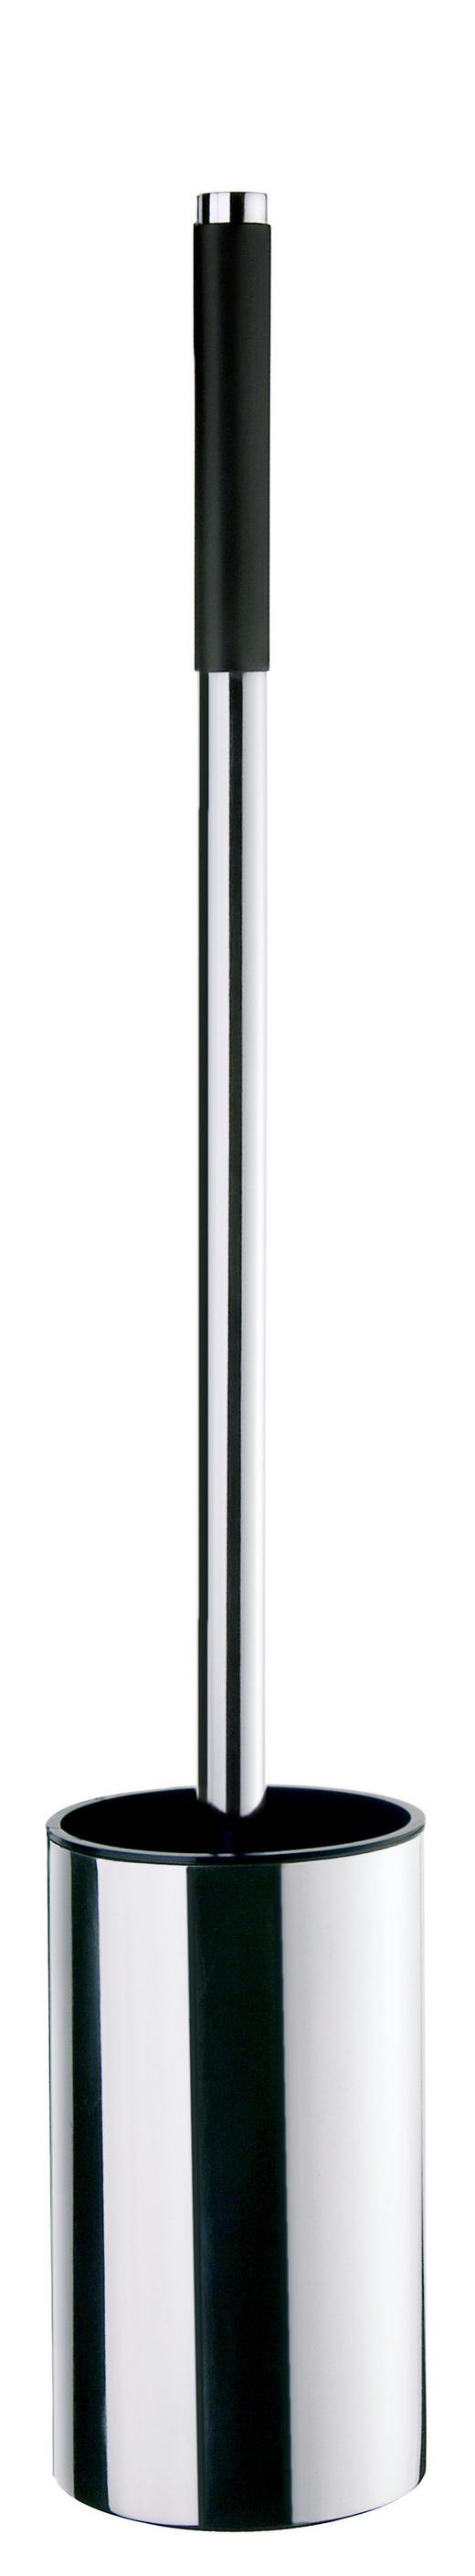 WC-BÜRSTENGARNITUR in Metall - Edelstahlfarben, Basics, Kunststoff/Metall (0/52cm)